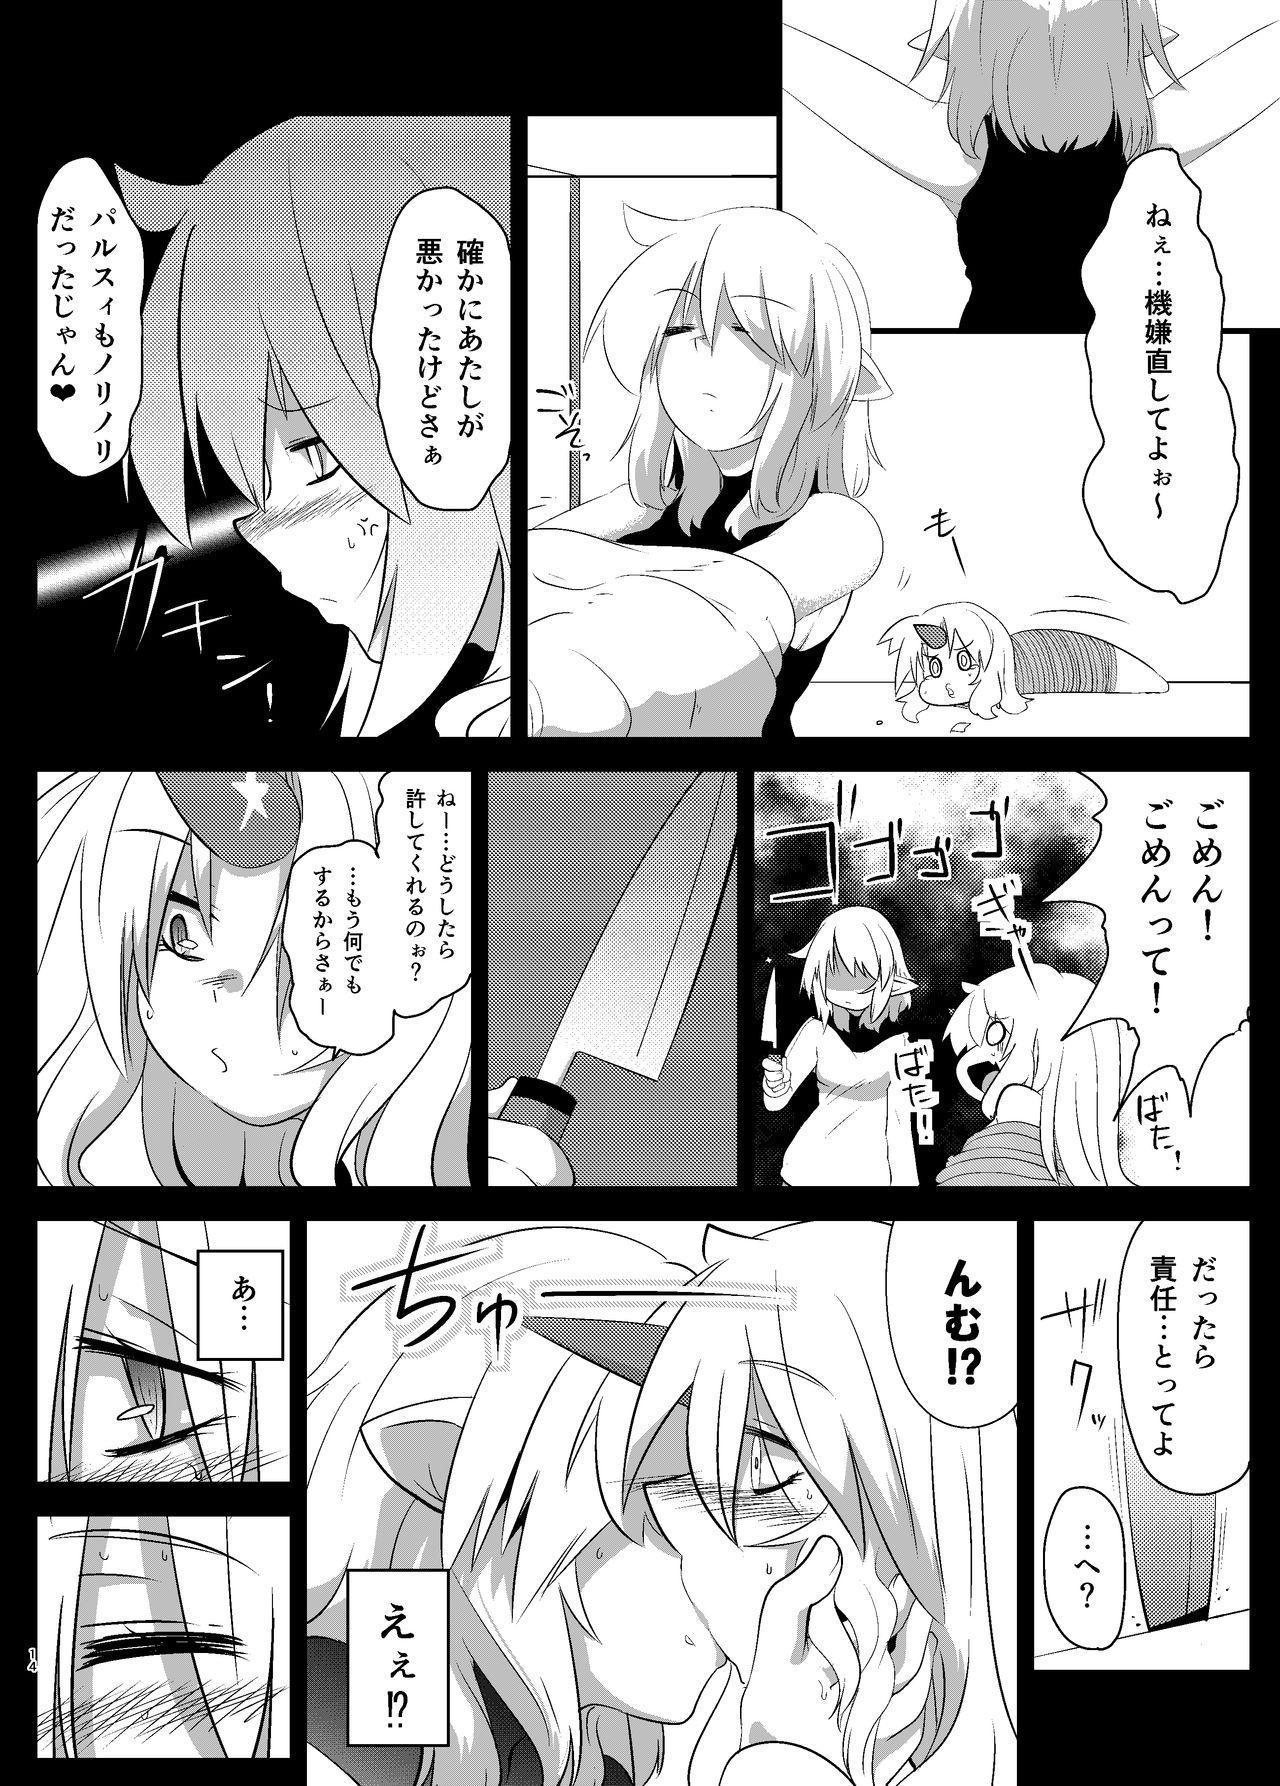 Yurushite Hashihime-sama 13